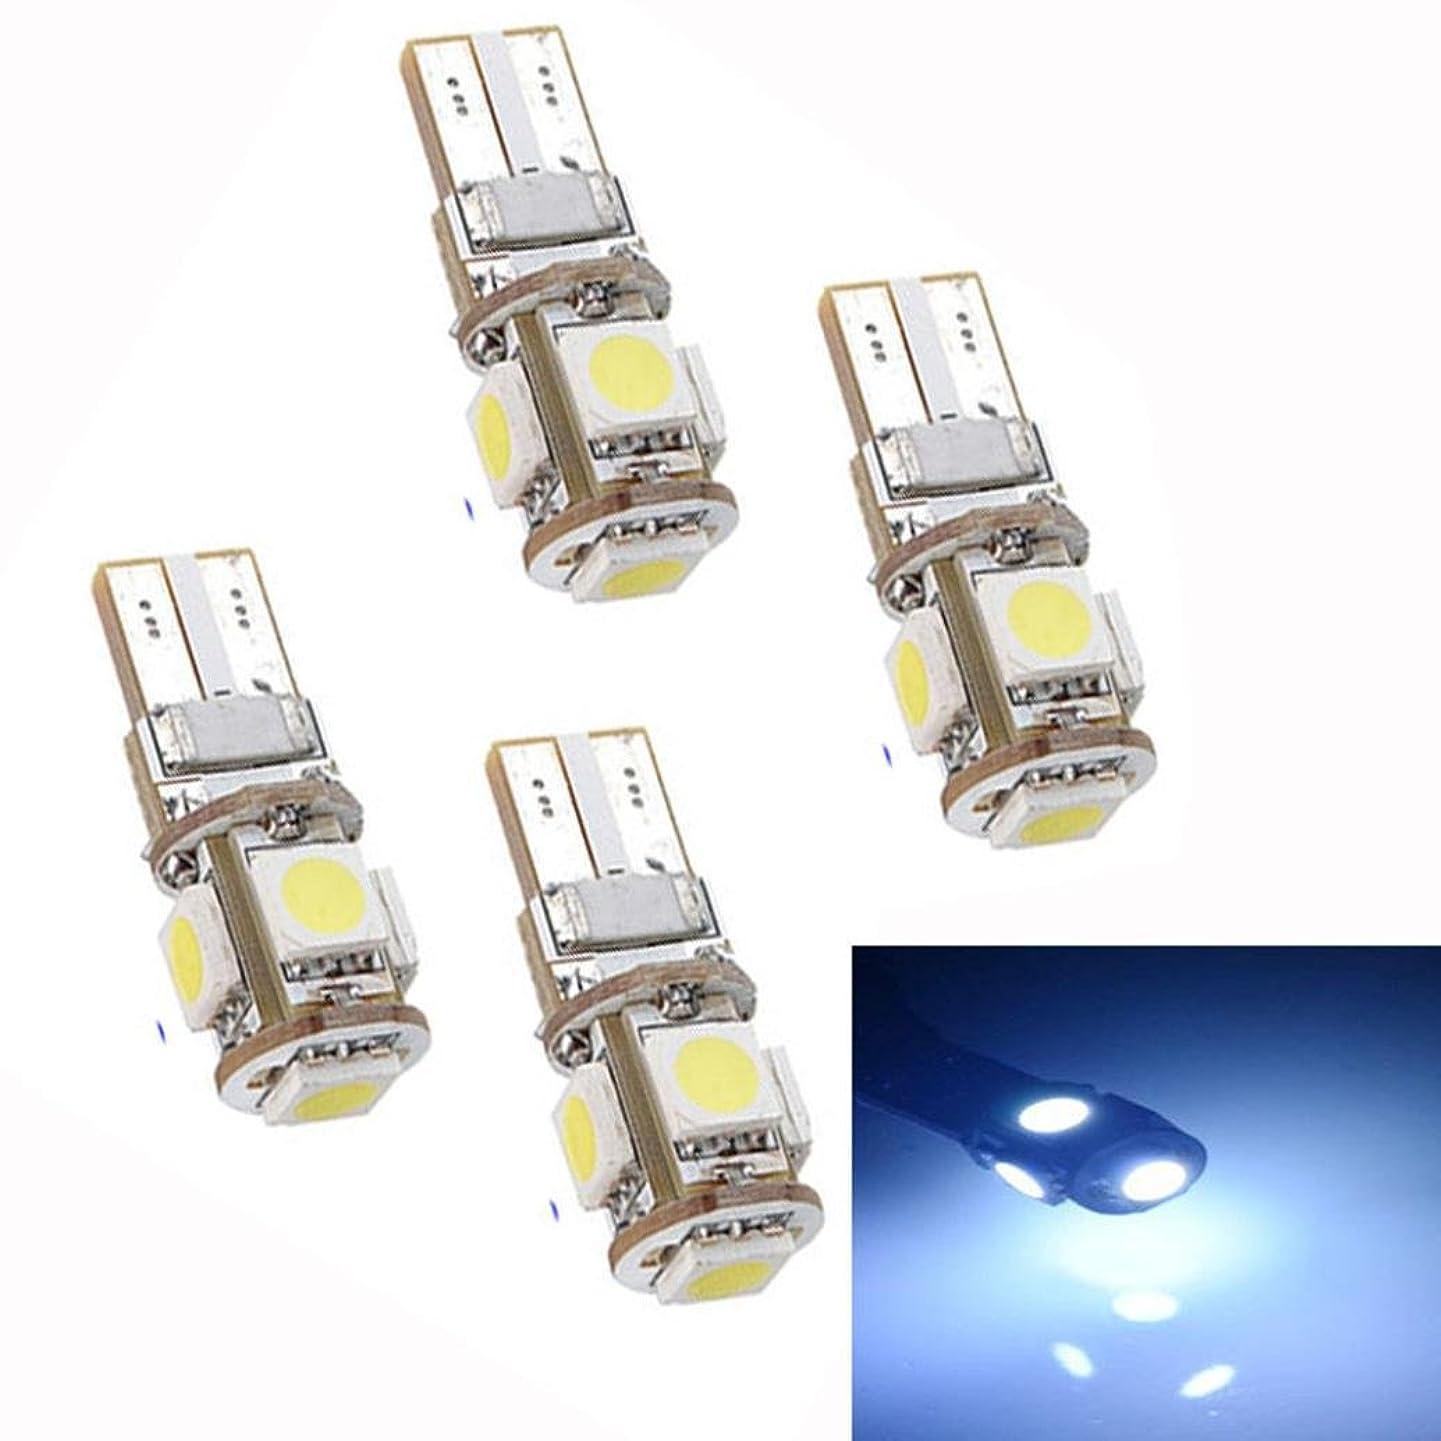 Quaant Car LED Light,4 X LED Bulb Canbus Error Free White T10 5-SMD 5050 W5W 194 16 Interior (White)